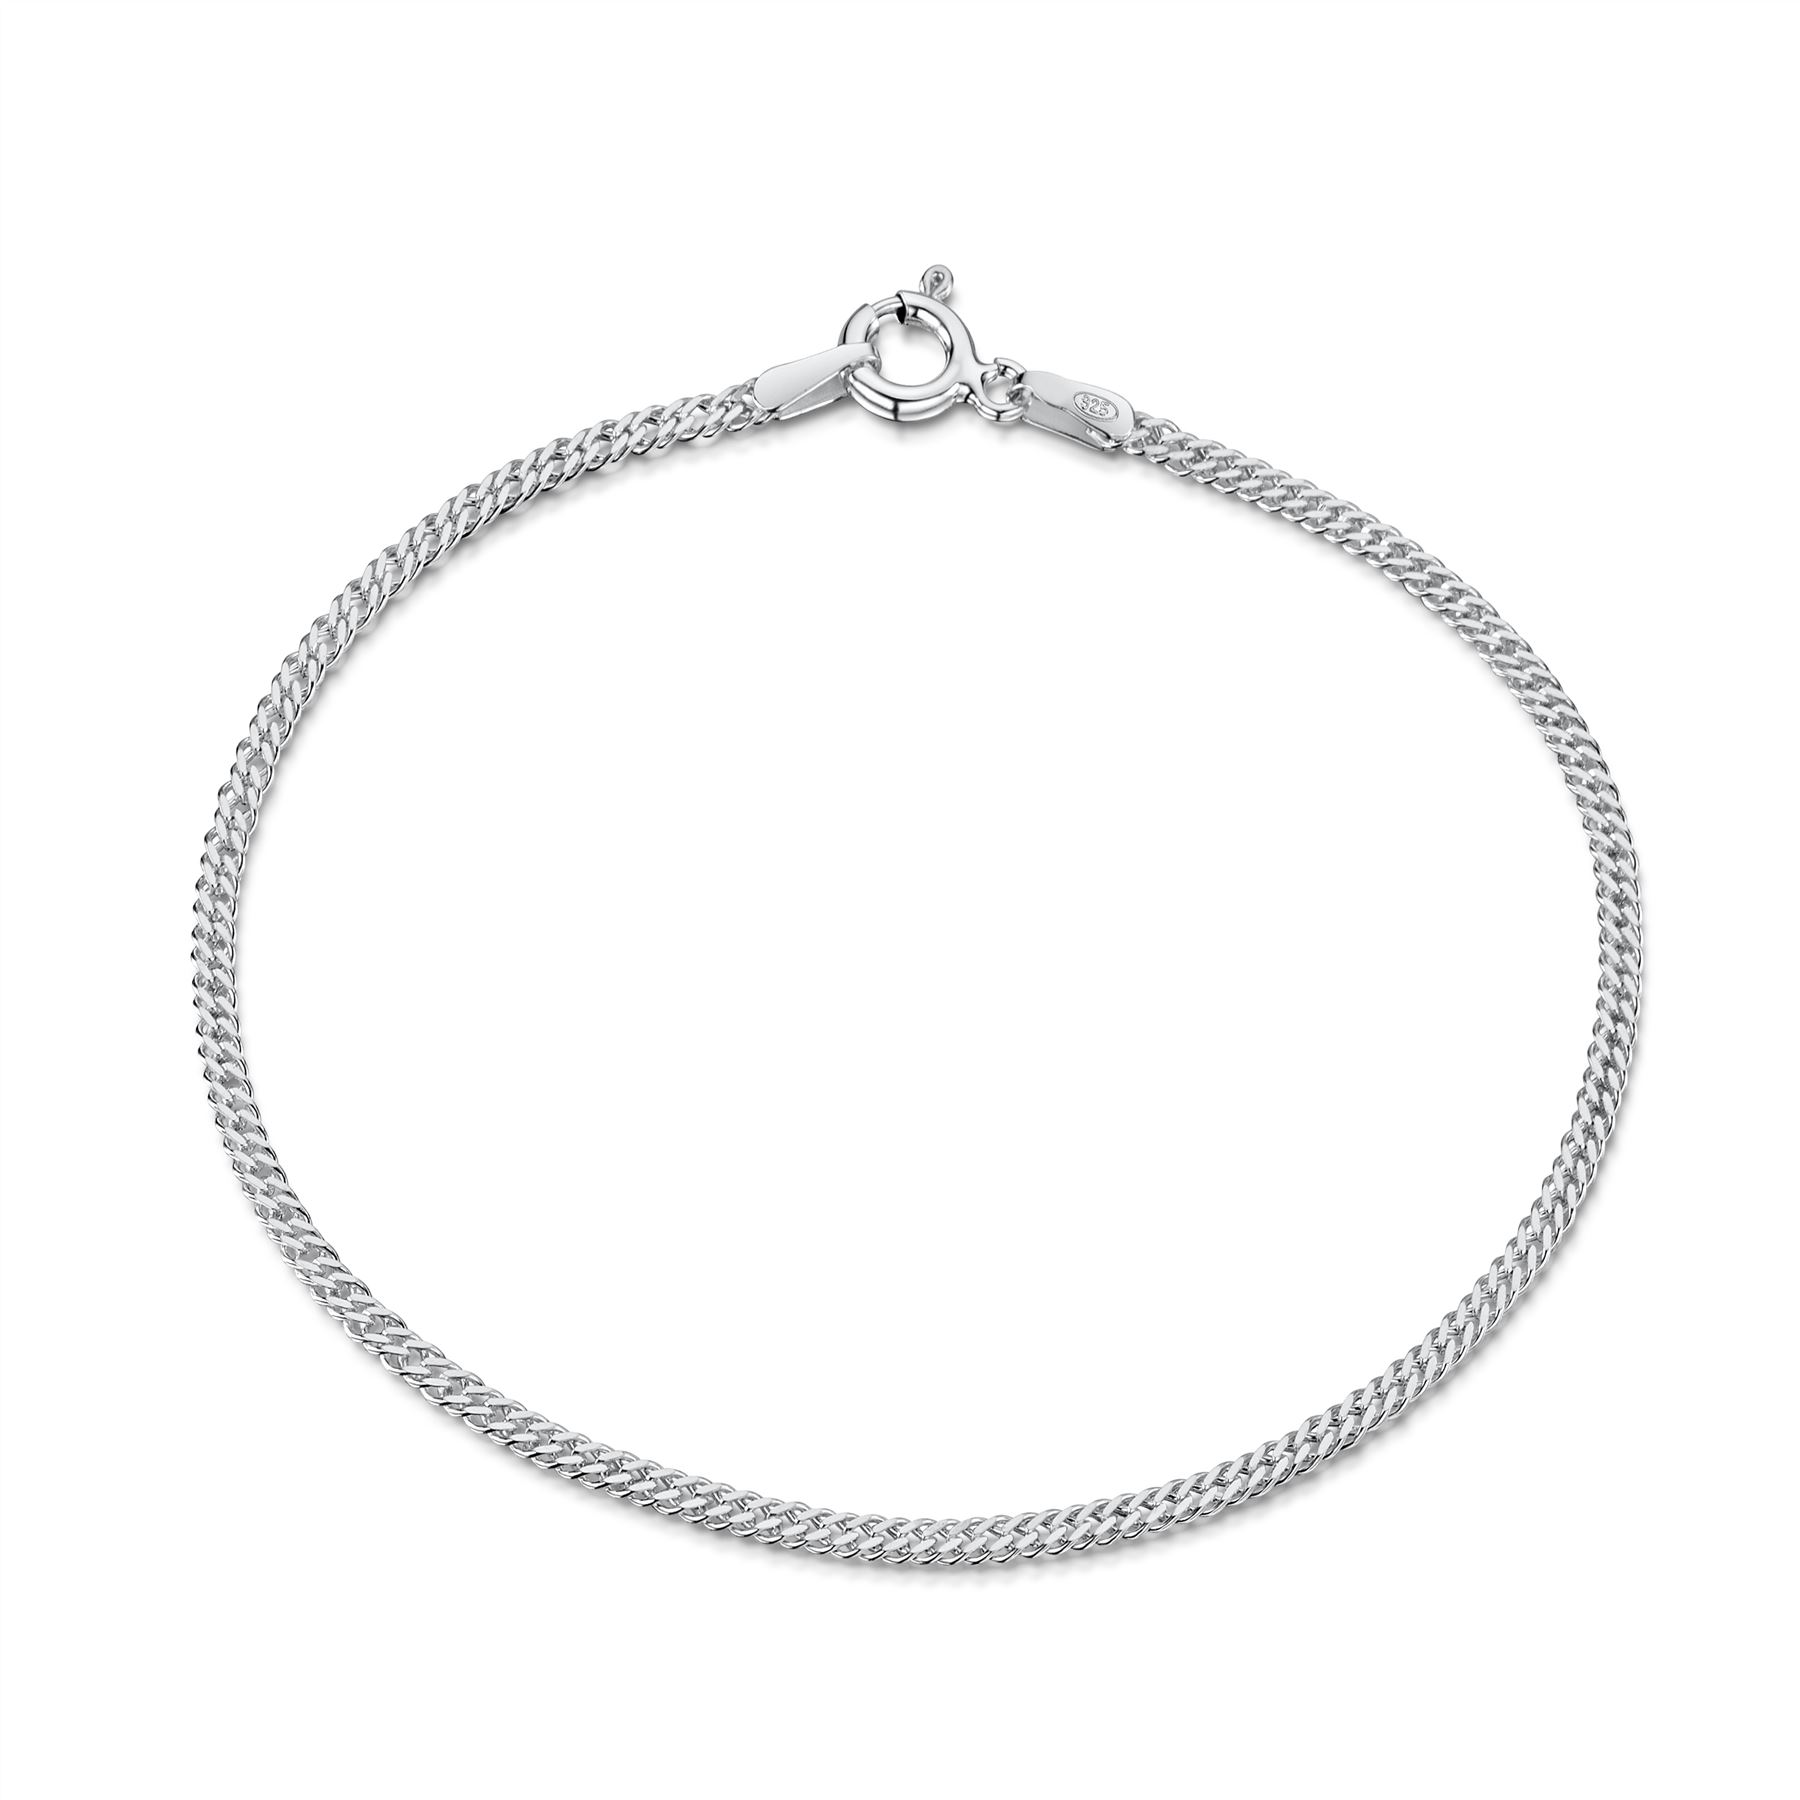 Amberta-Pulsera-en-Autentica-Plata-De-Ley-925-Brazalete-Precioso-para-Mujer miniatura 53